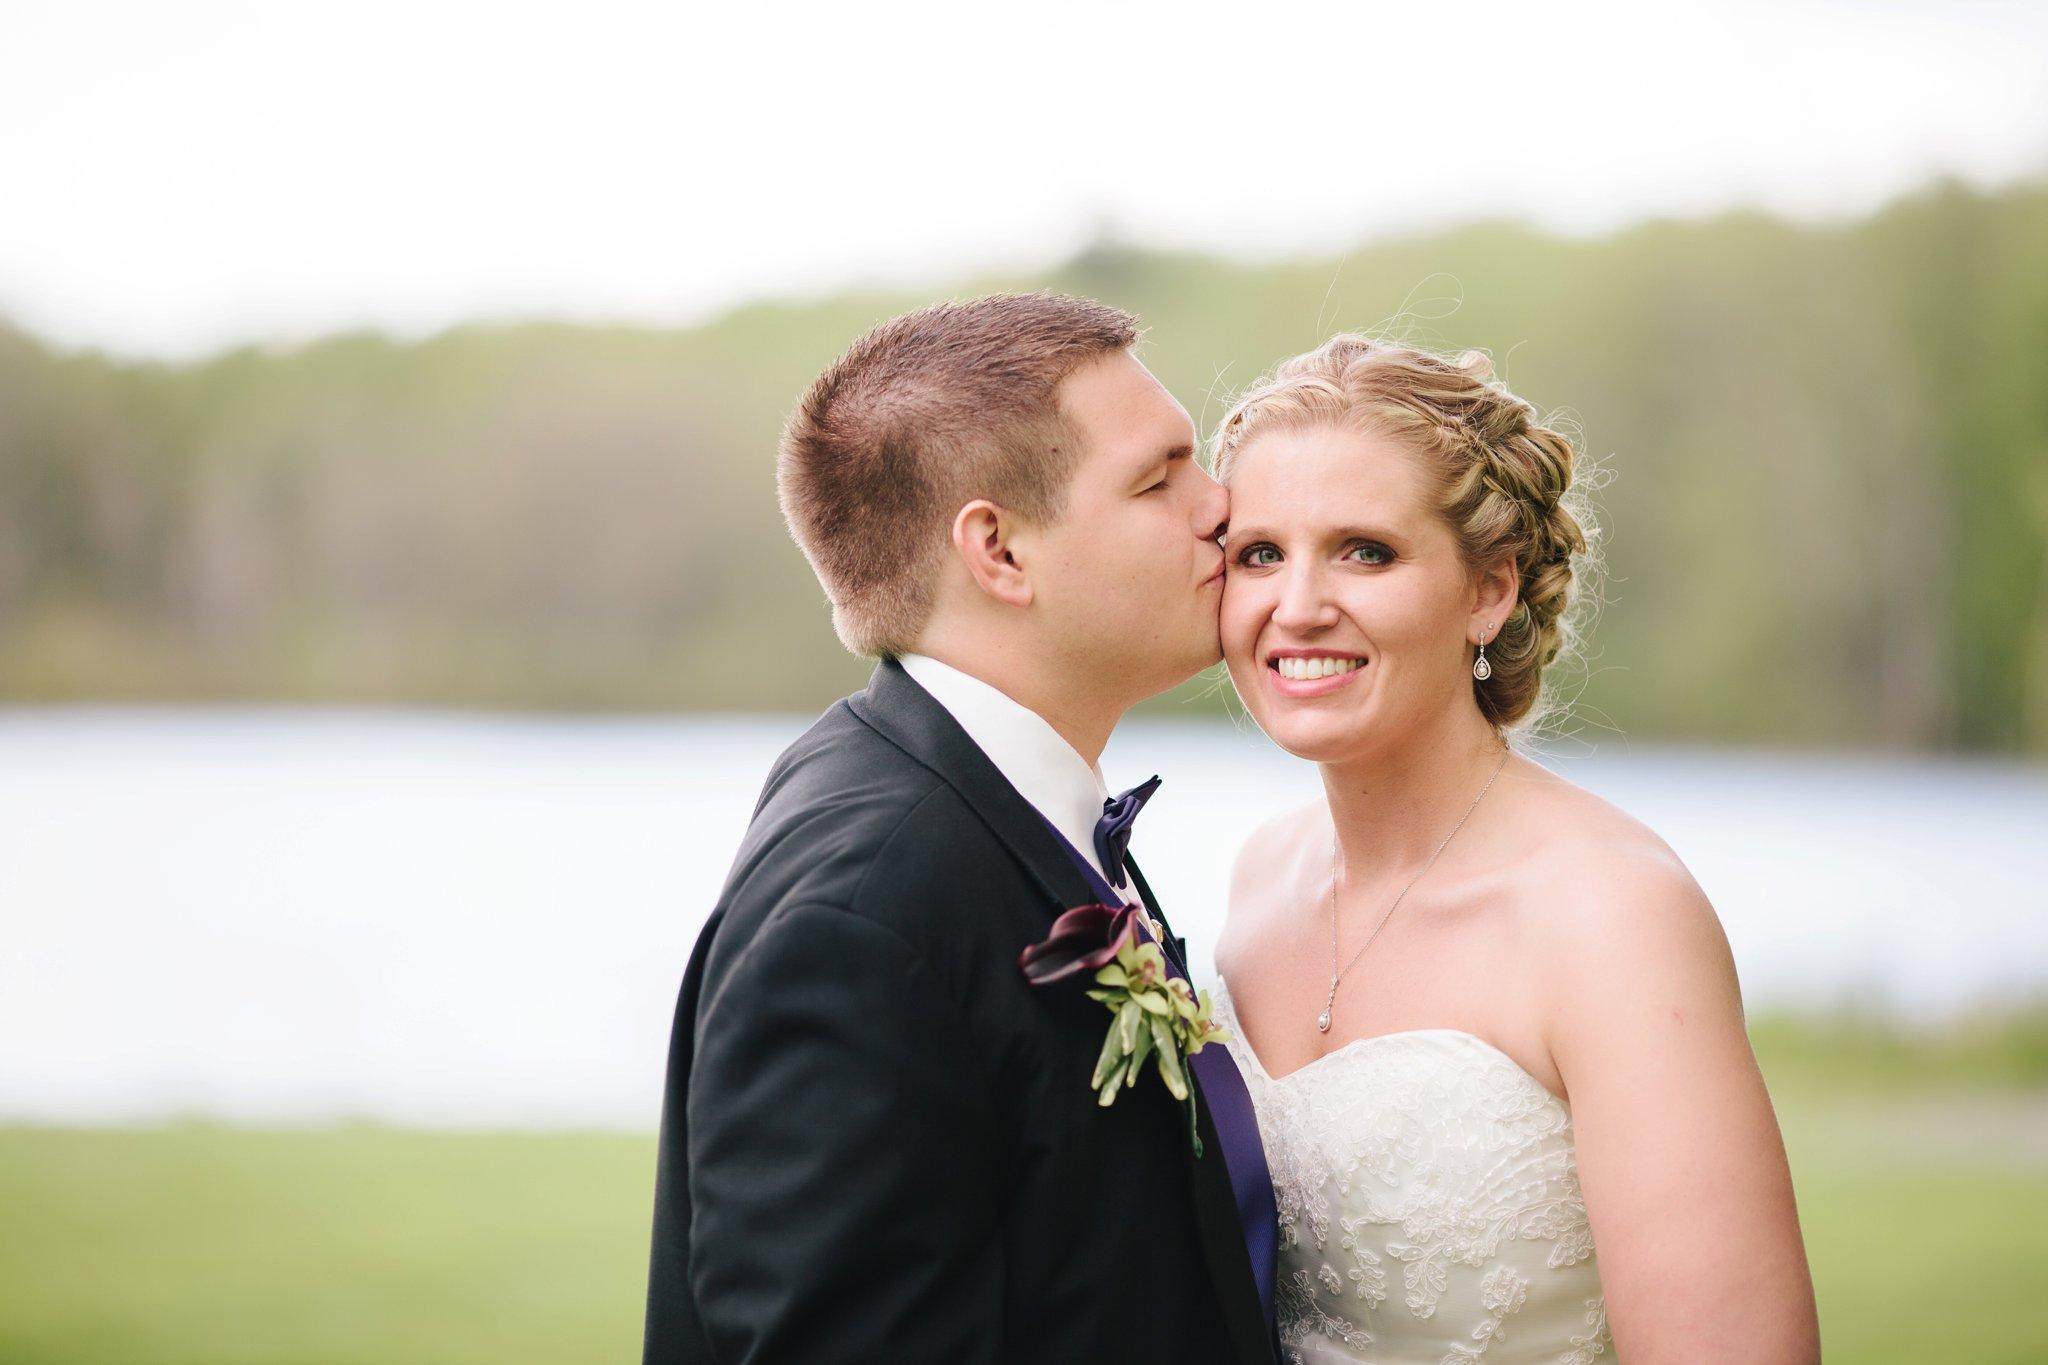 montdale_country_club_wedding_photos_photographer_scranton_pa7156.jpg